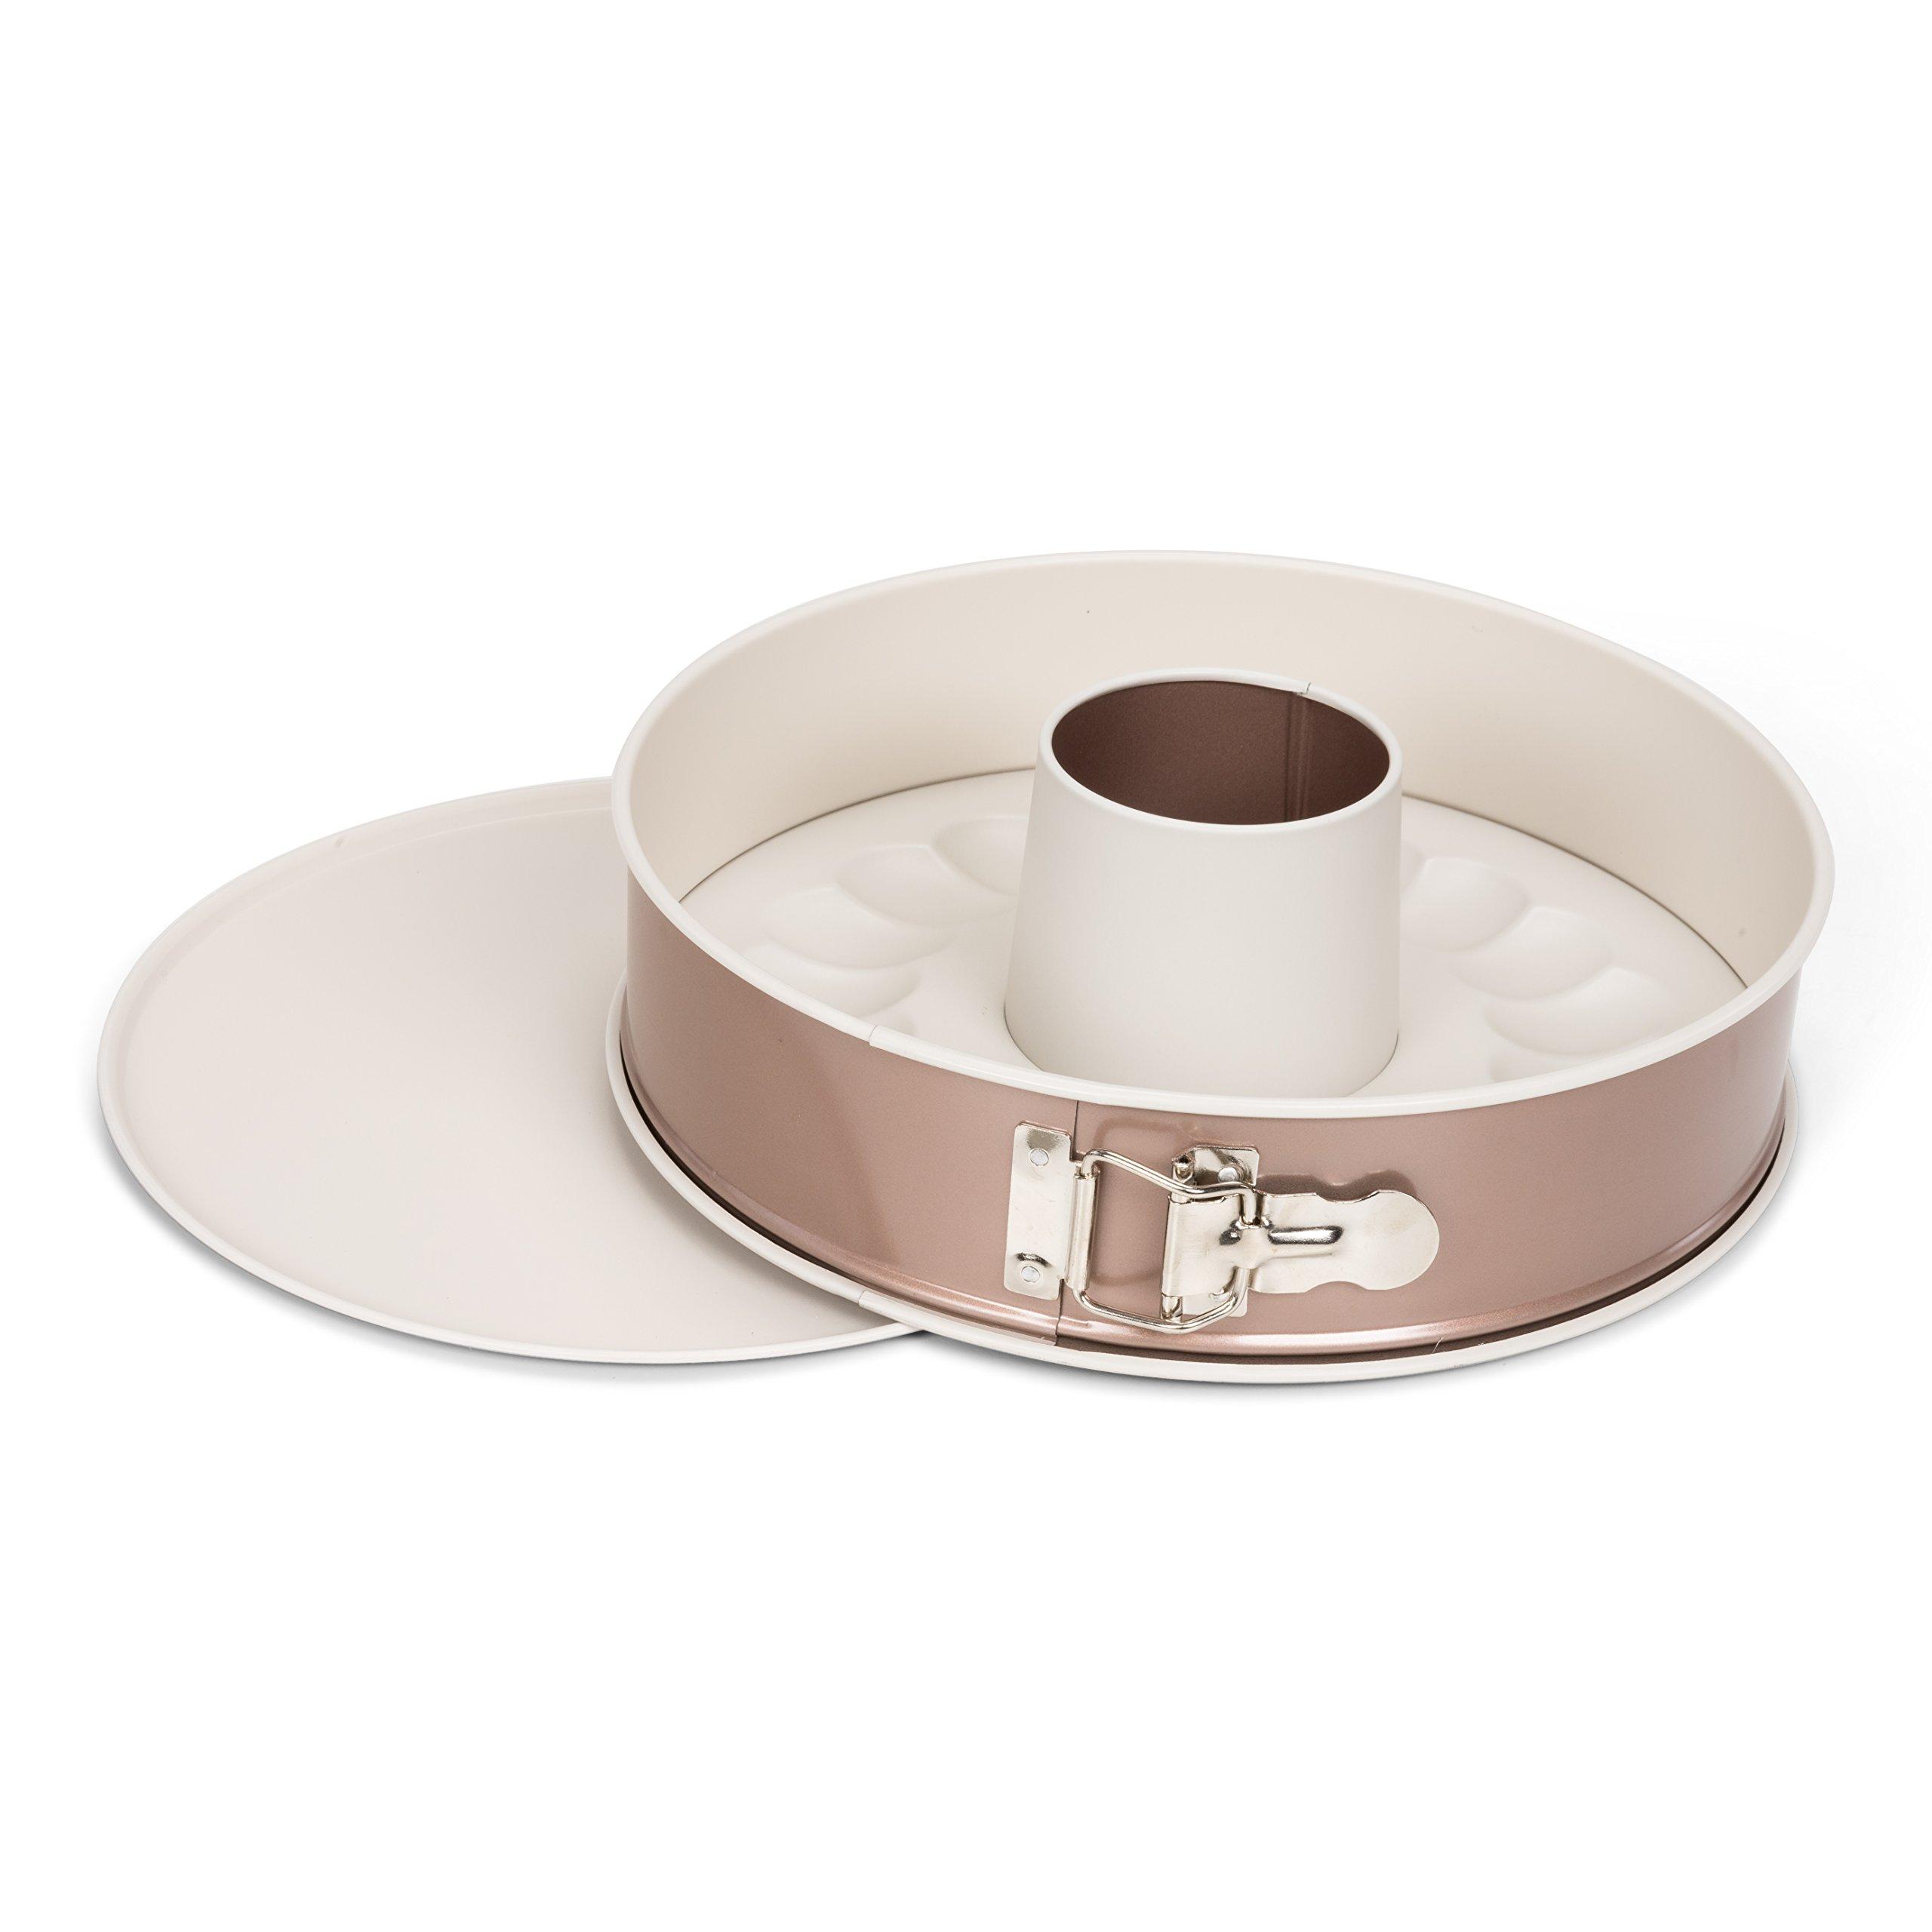 Patisse 03346 w/Extra Bottom Ceramic Springform Bundt Pan 10-1/4''(26 cm), 10.25'', Copper Off White by patisse